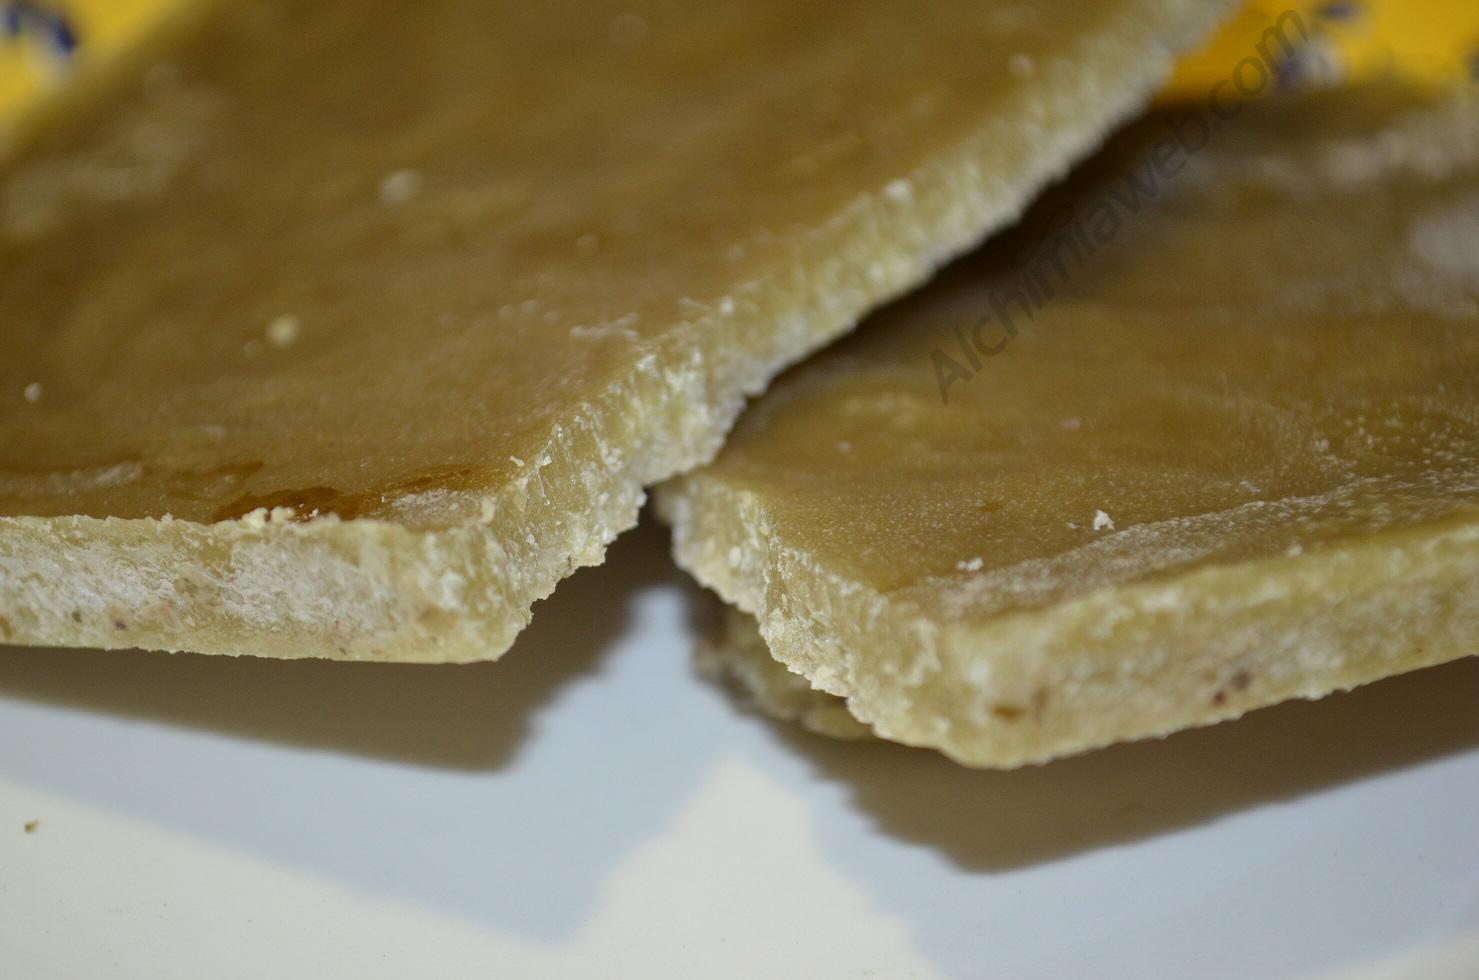 Beurre de cannabis v g talien cuisiner l huile de coco - Cuisiner avec l huile de coco ...